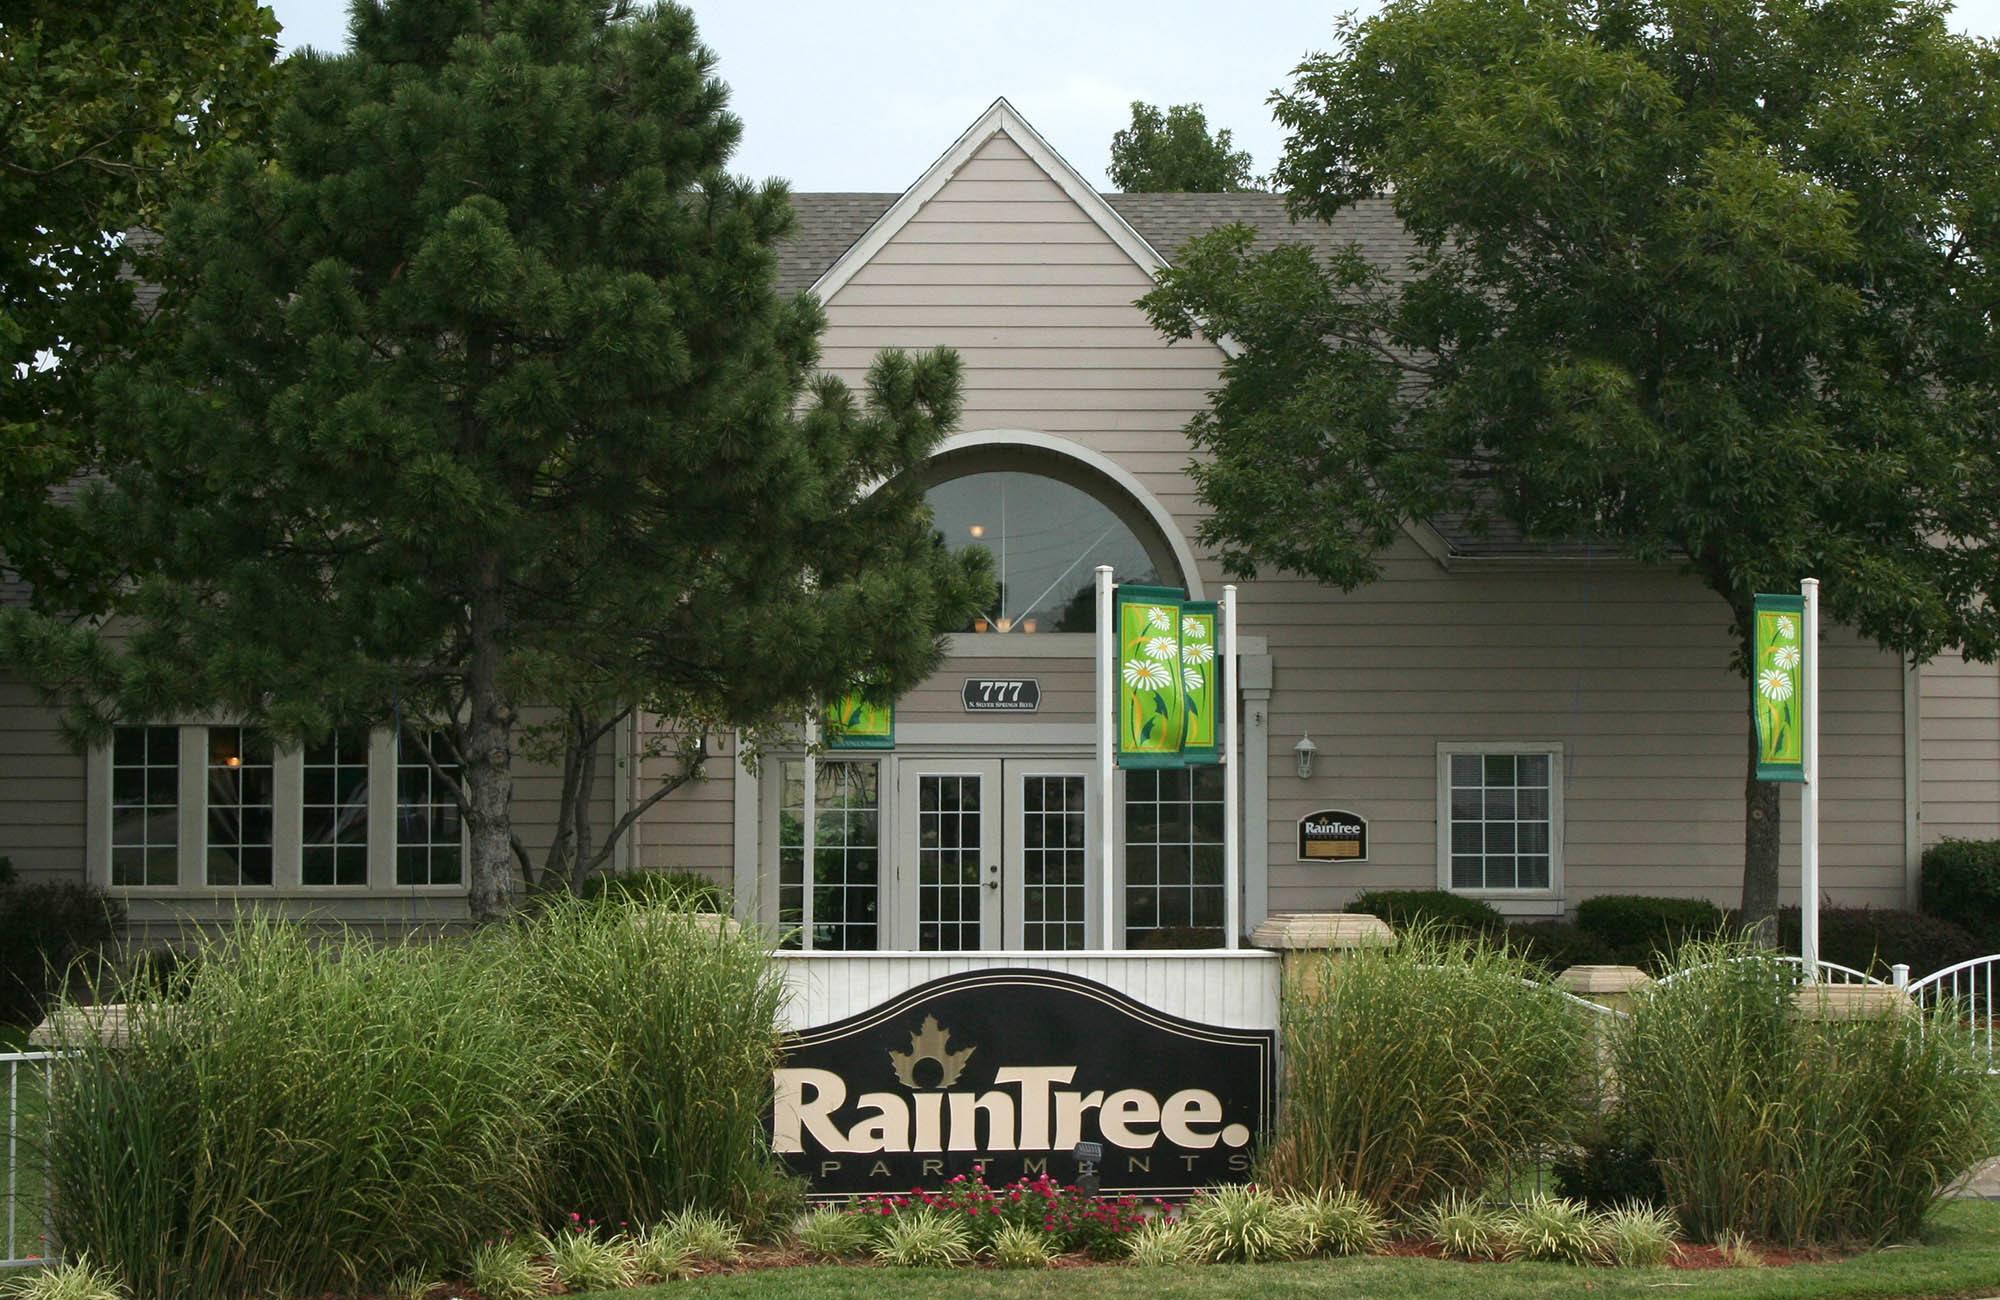 Raintree Apartments in Wichita